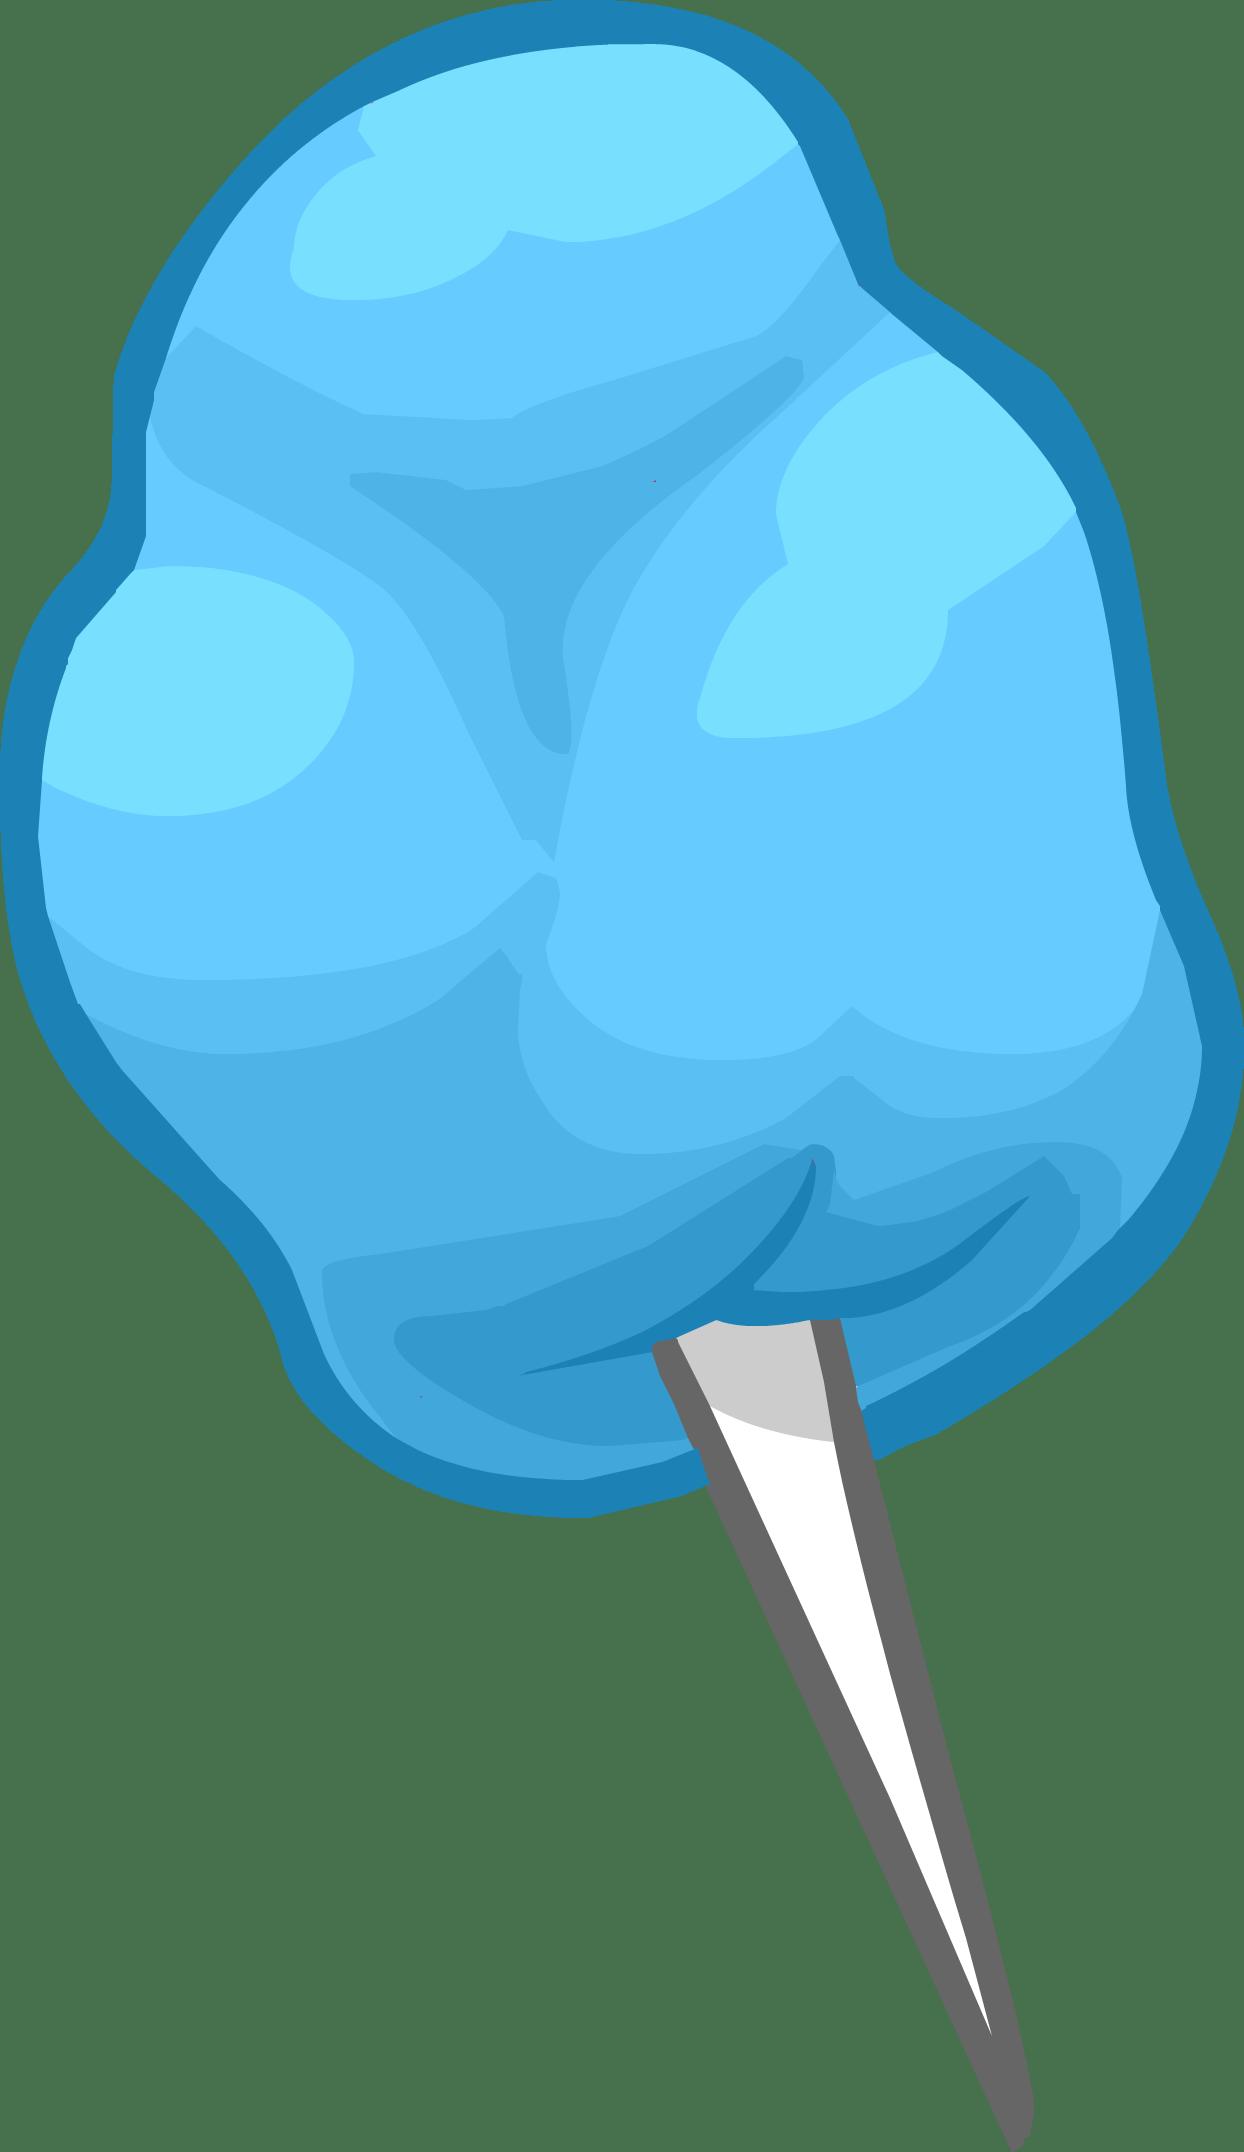 Candy transparent background. Blue cotton clipart png